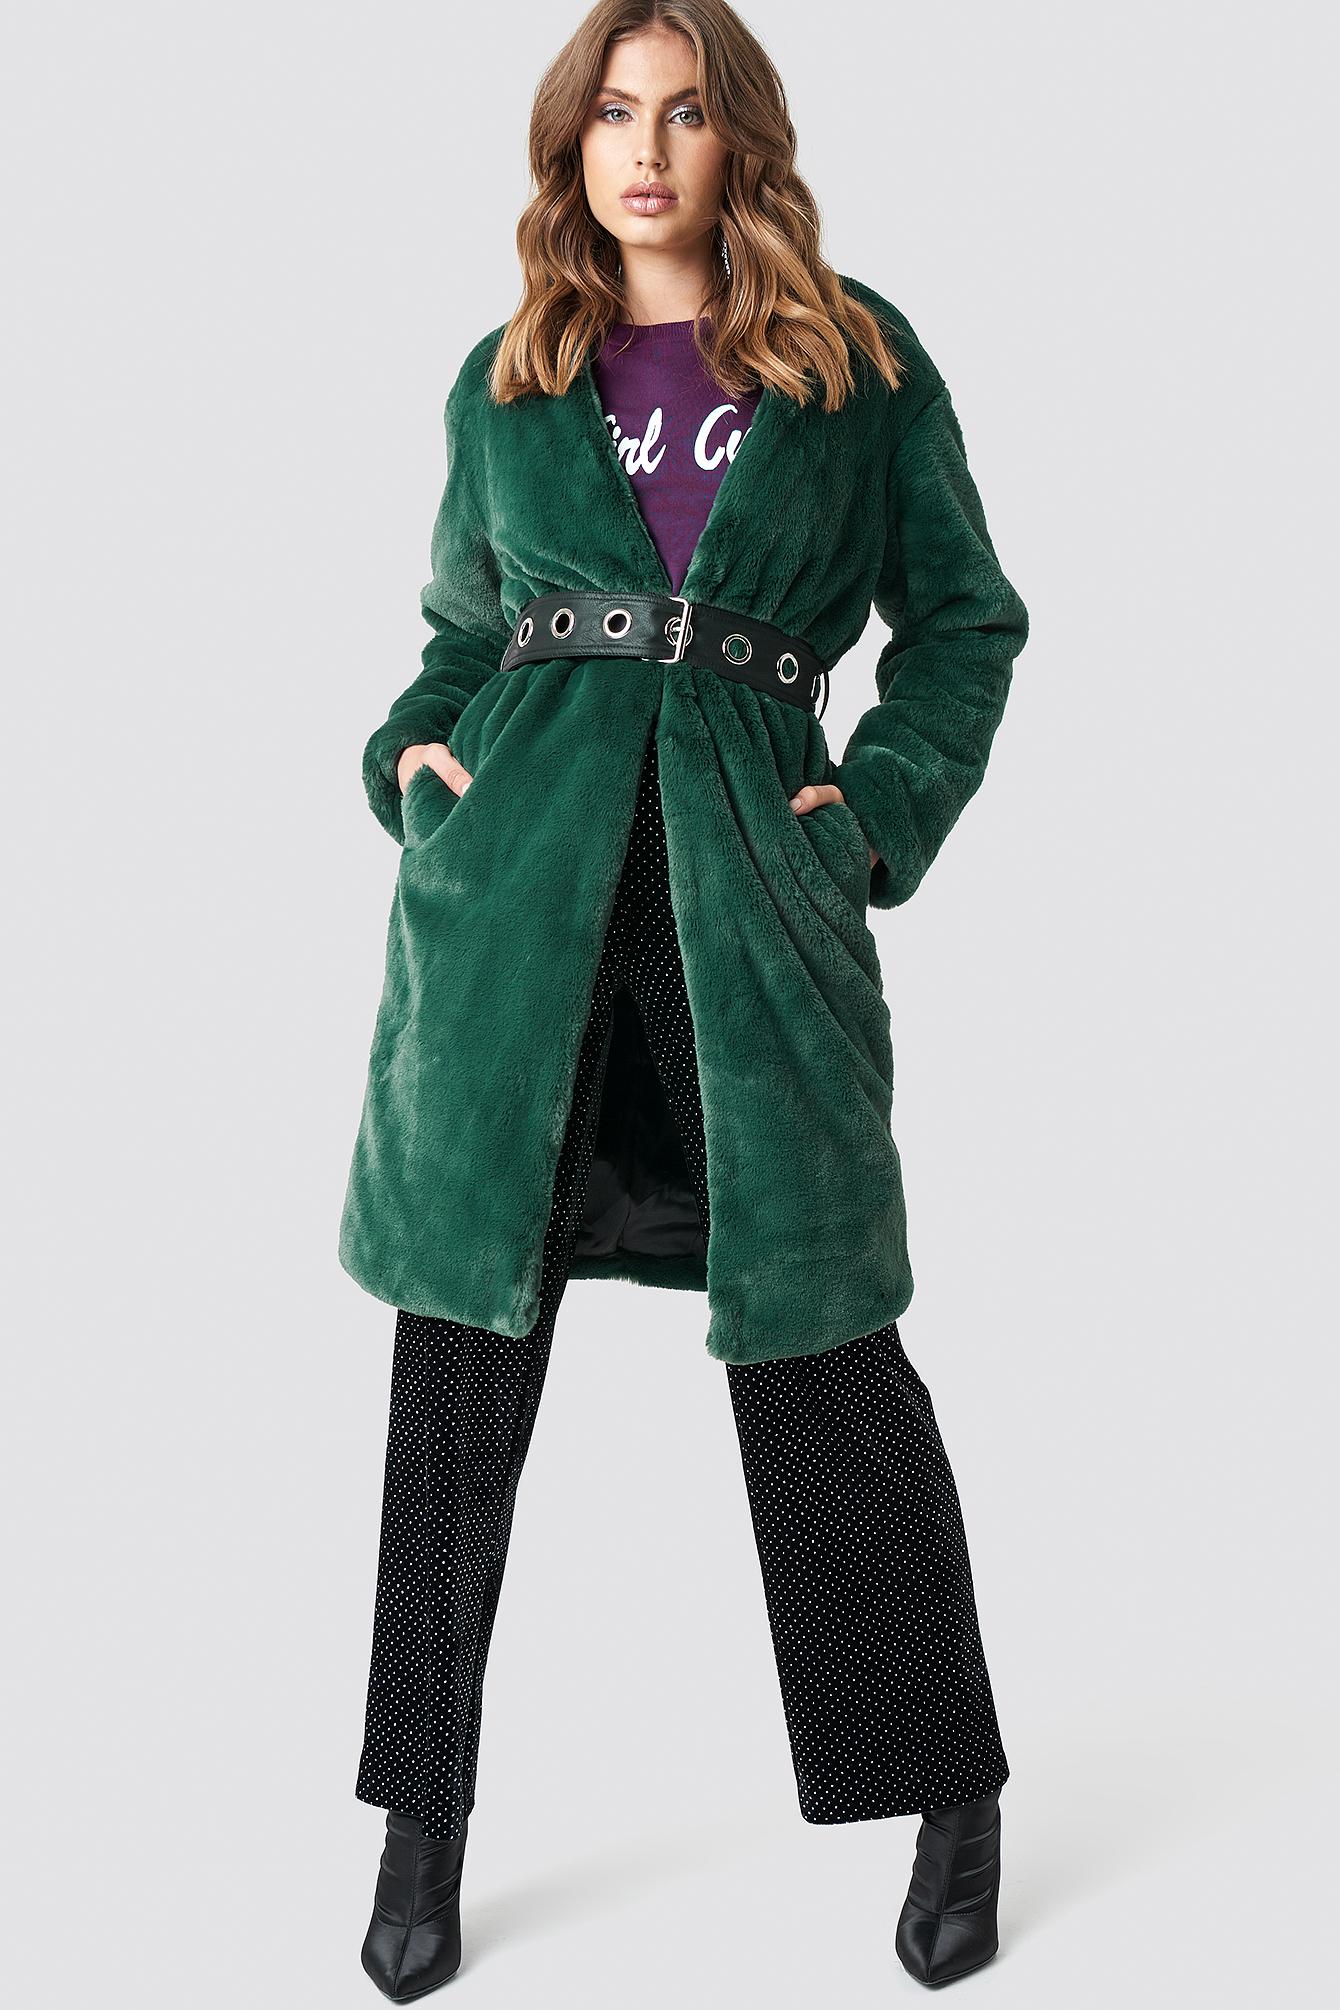 GALORE X NA-KD Big Fluffy Belted Coat - Green